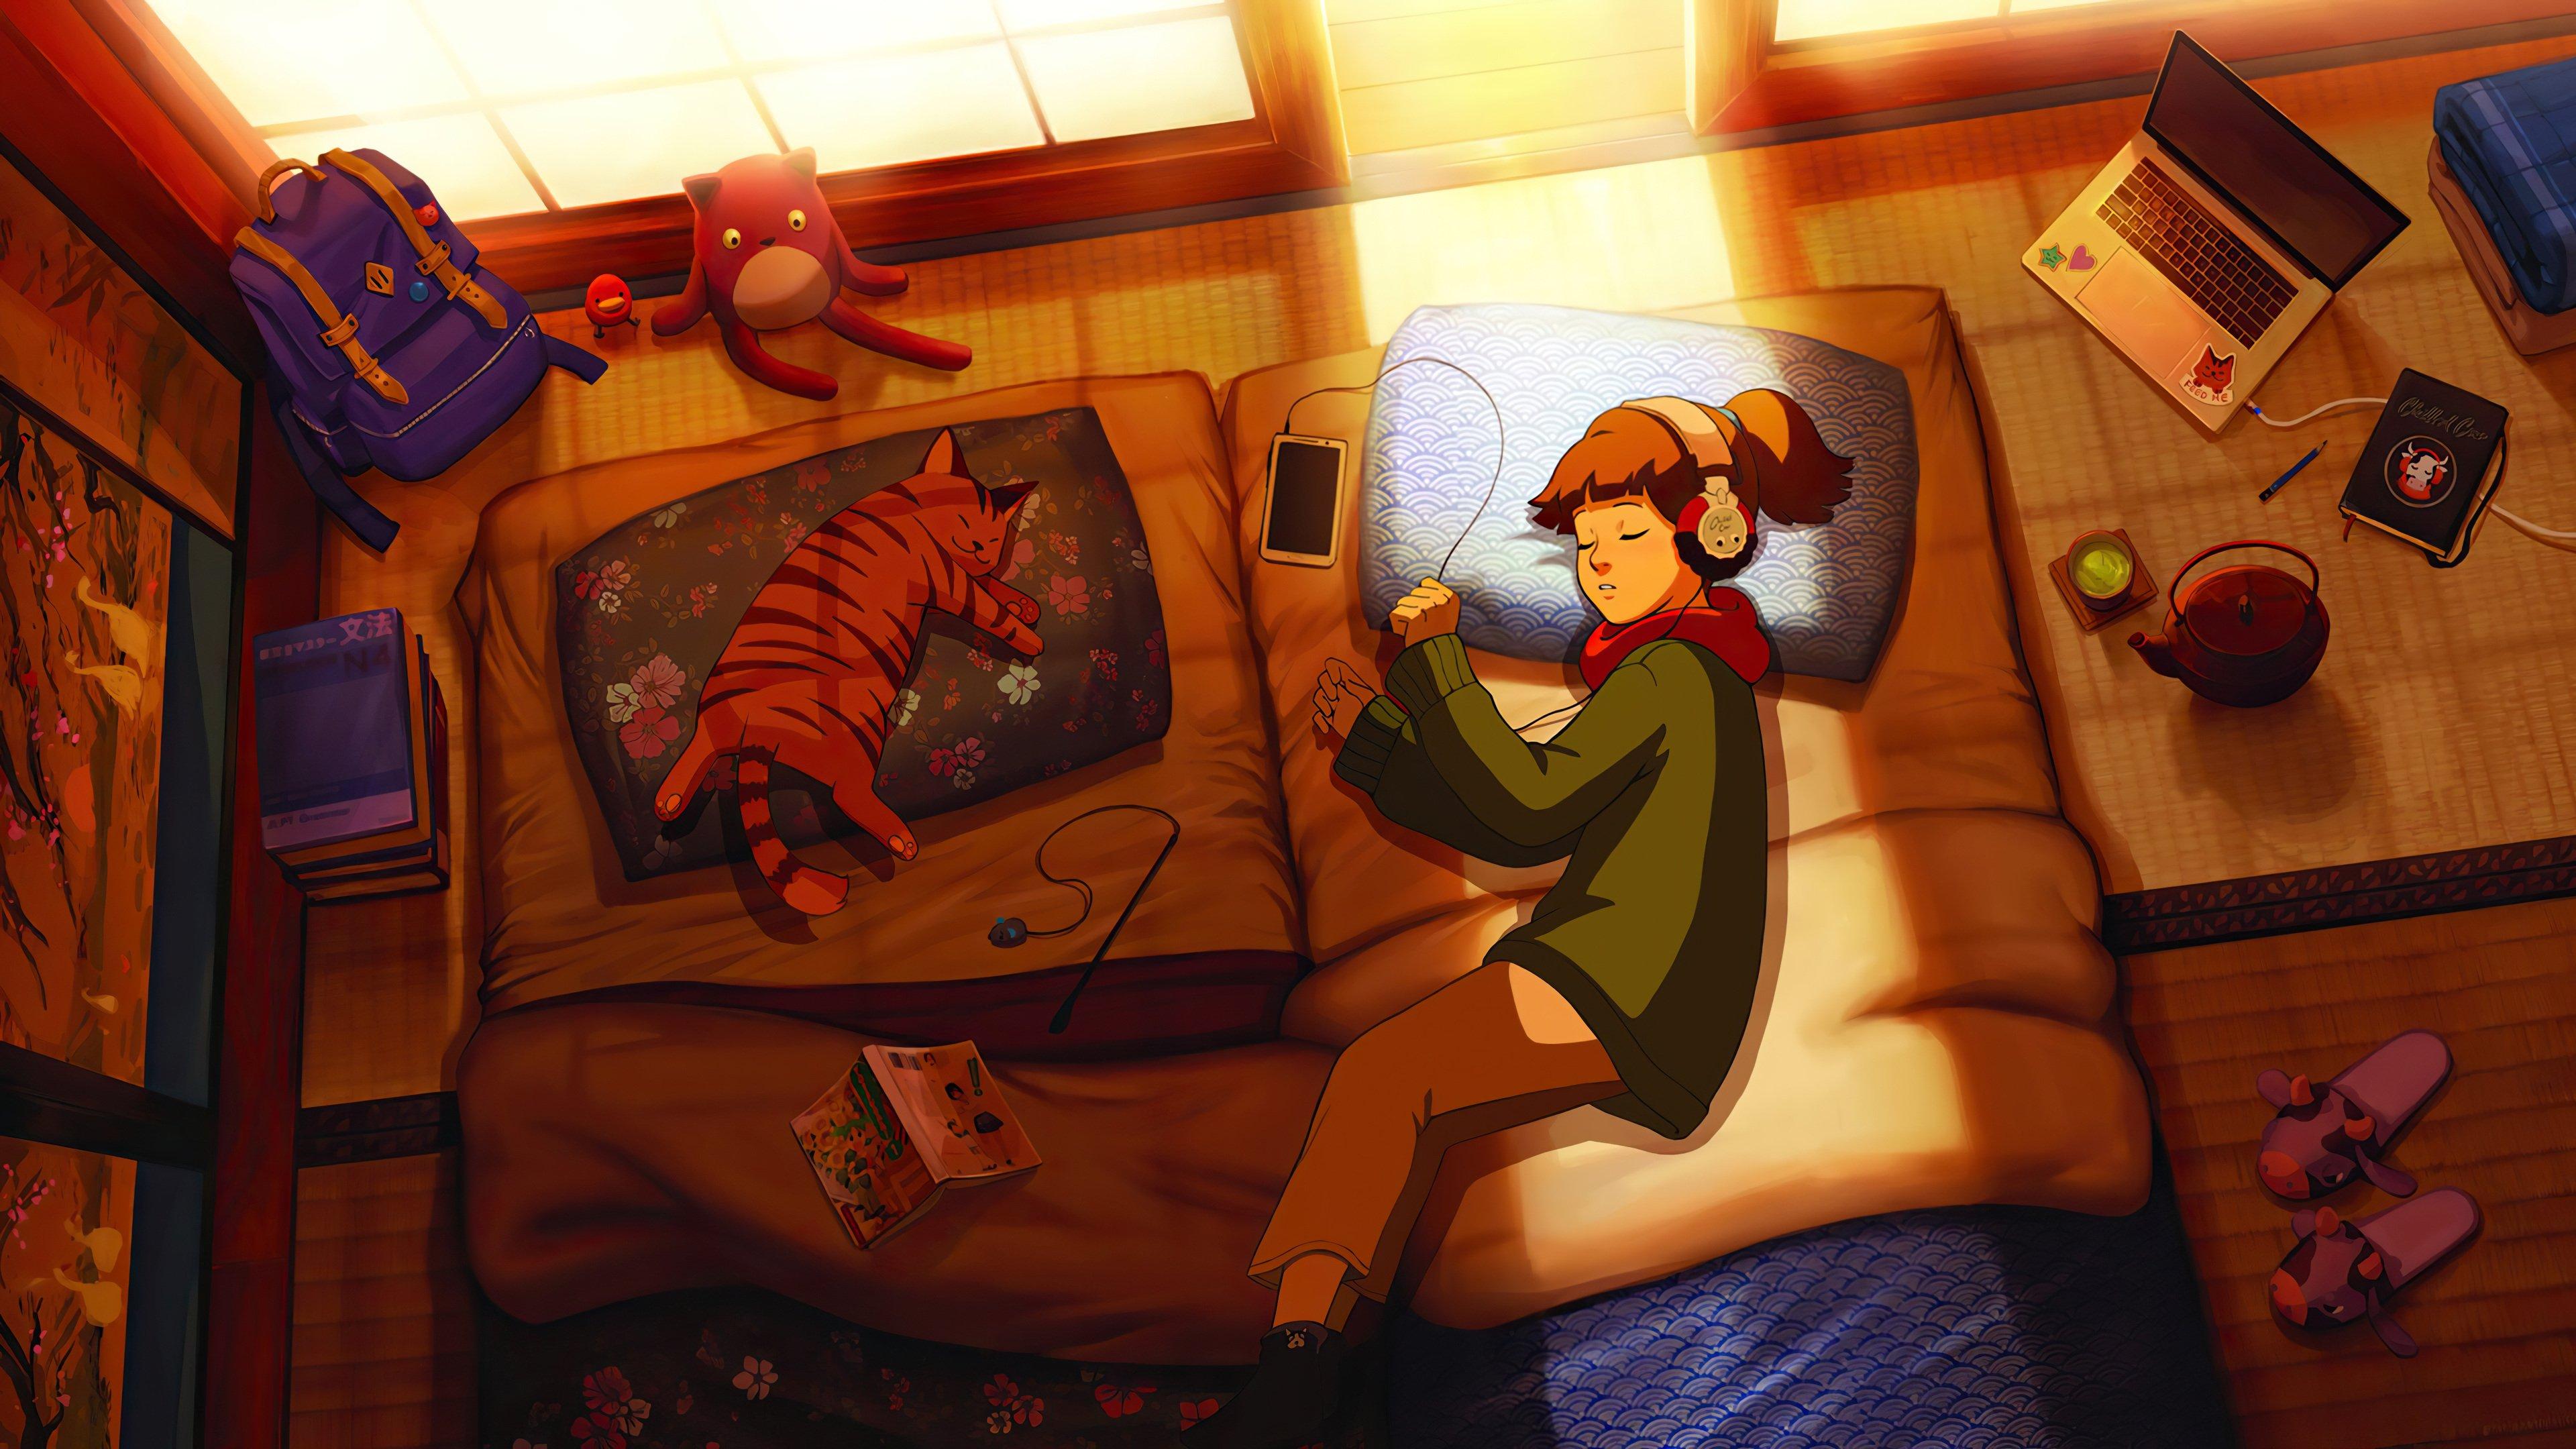 Wallpaper Girl and cat sleeping afternoon Lofi Art